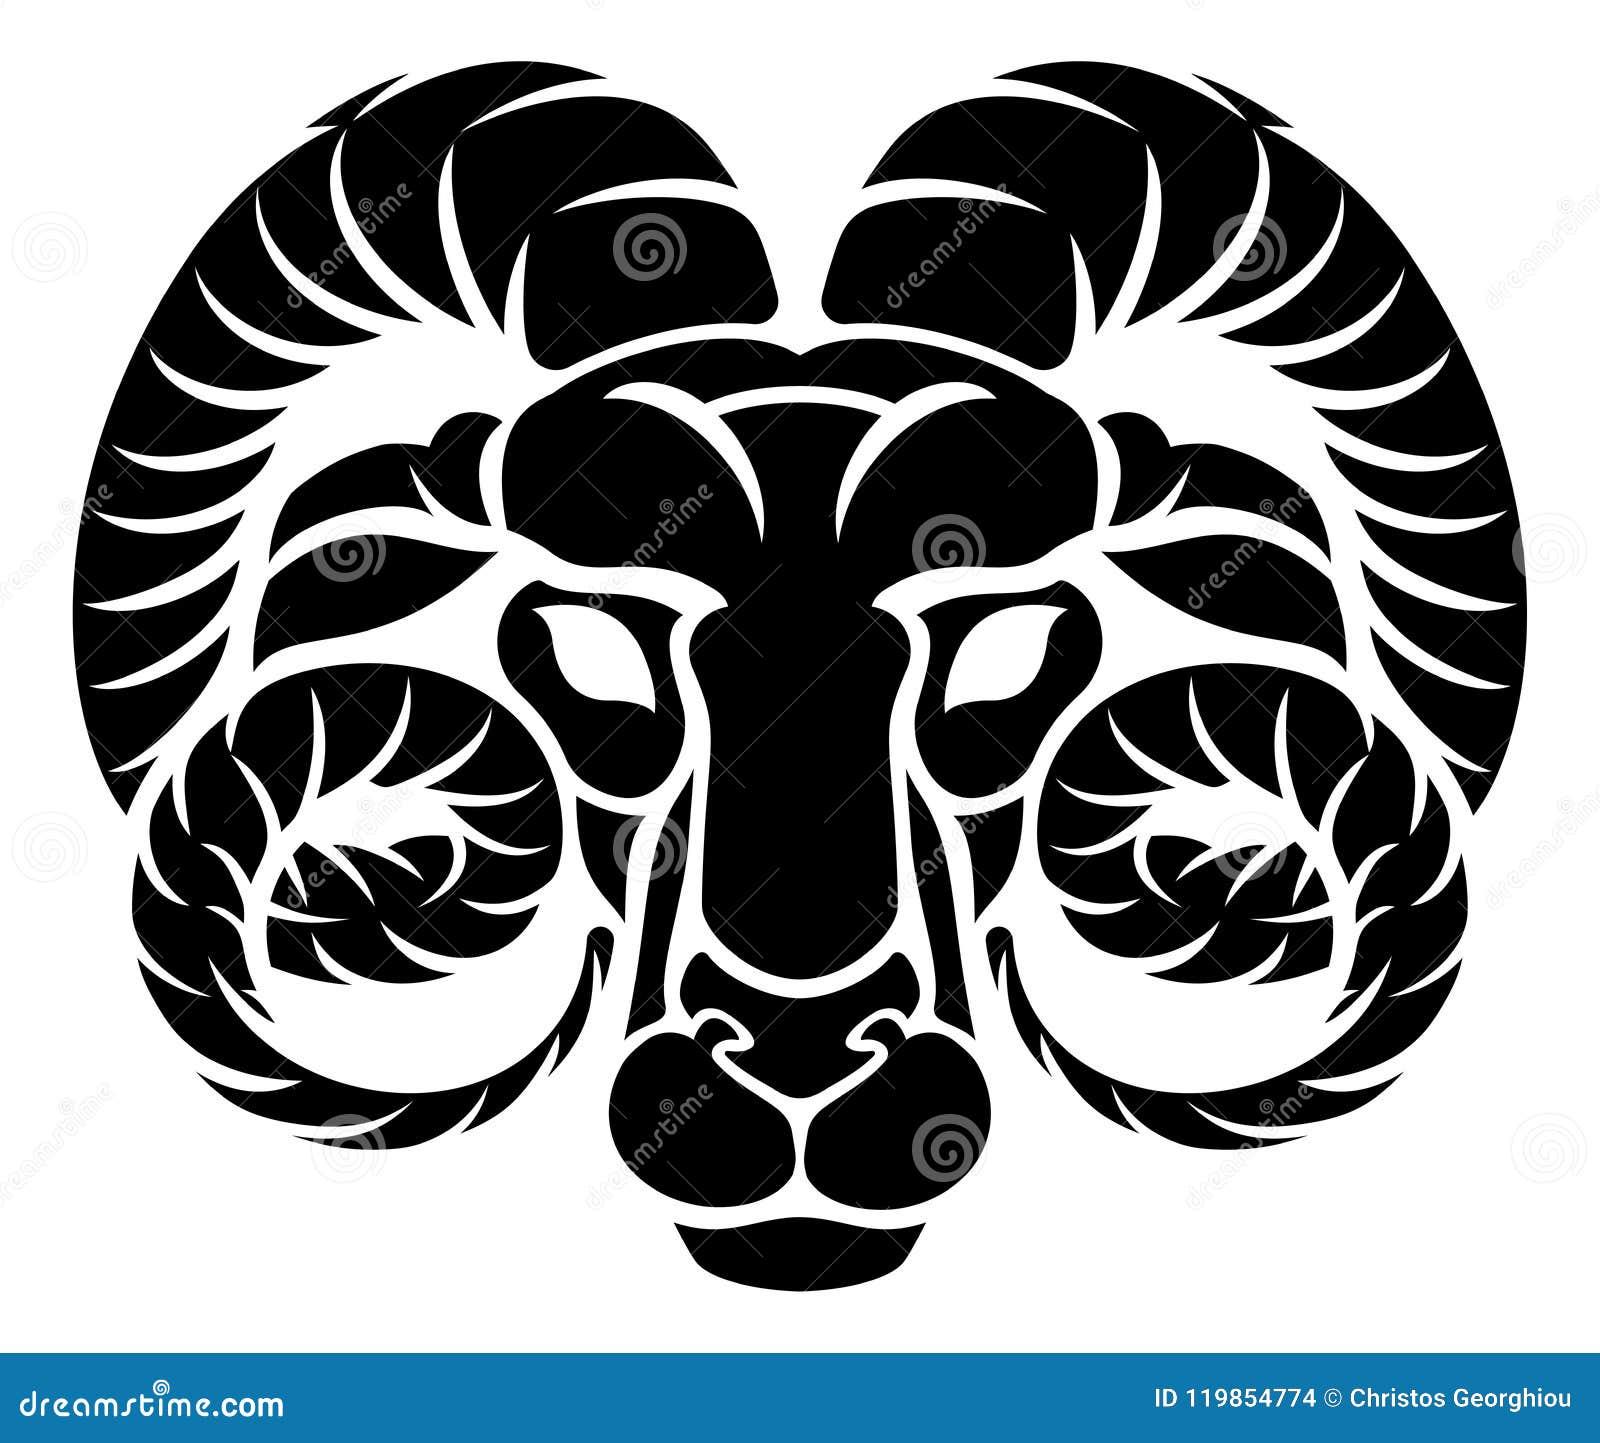 8a5fcfc4e Zodiac signs circular Aries ram horoscope astrology symbol